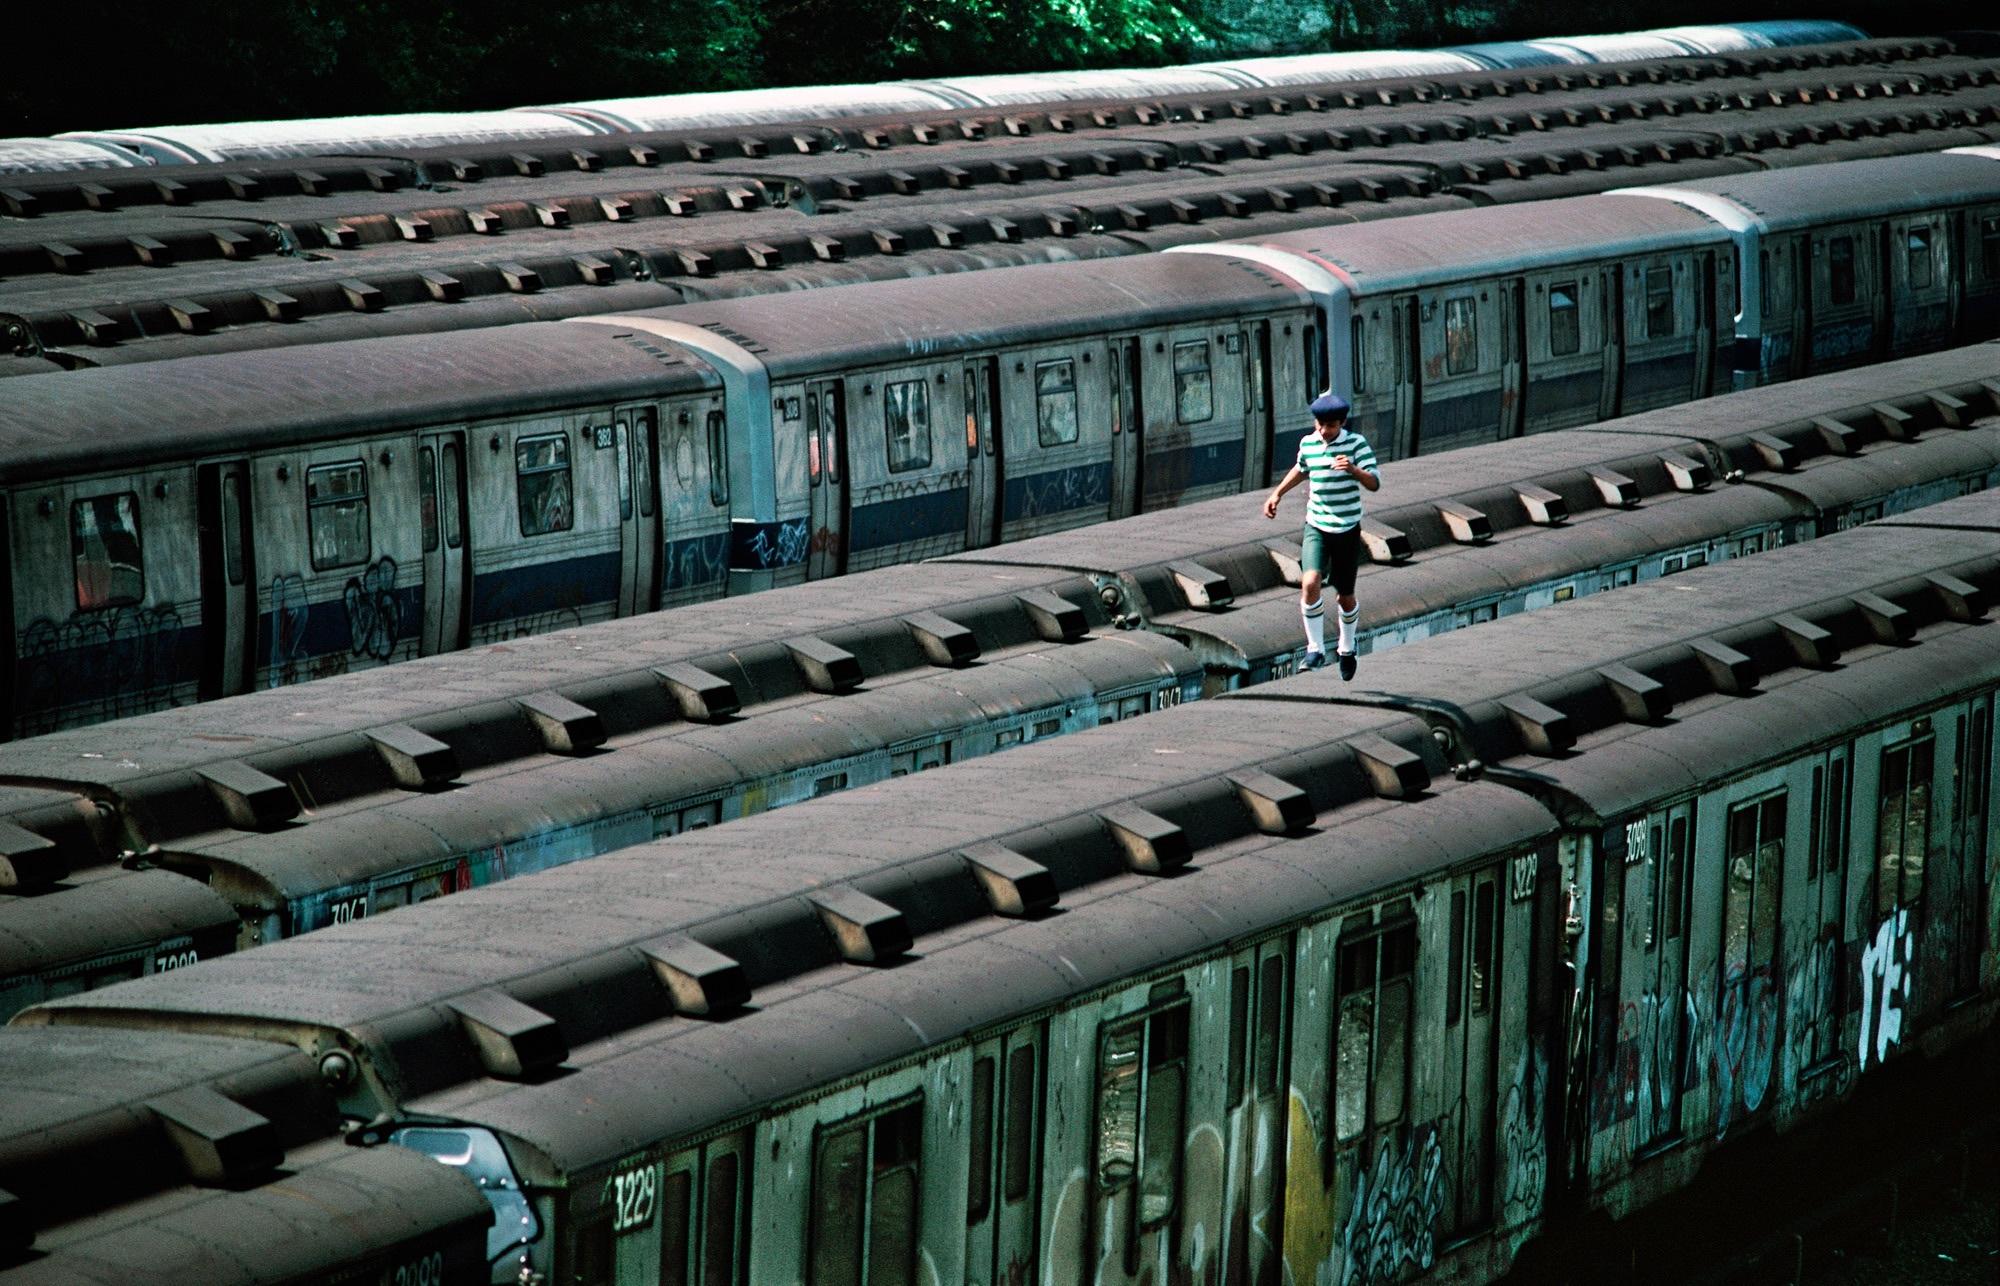 Boy running on top of train 1982 copyright marthacooper courtesy steven kasher gallery new york